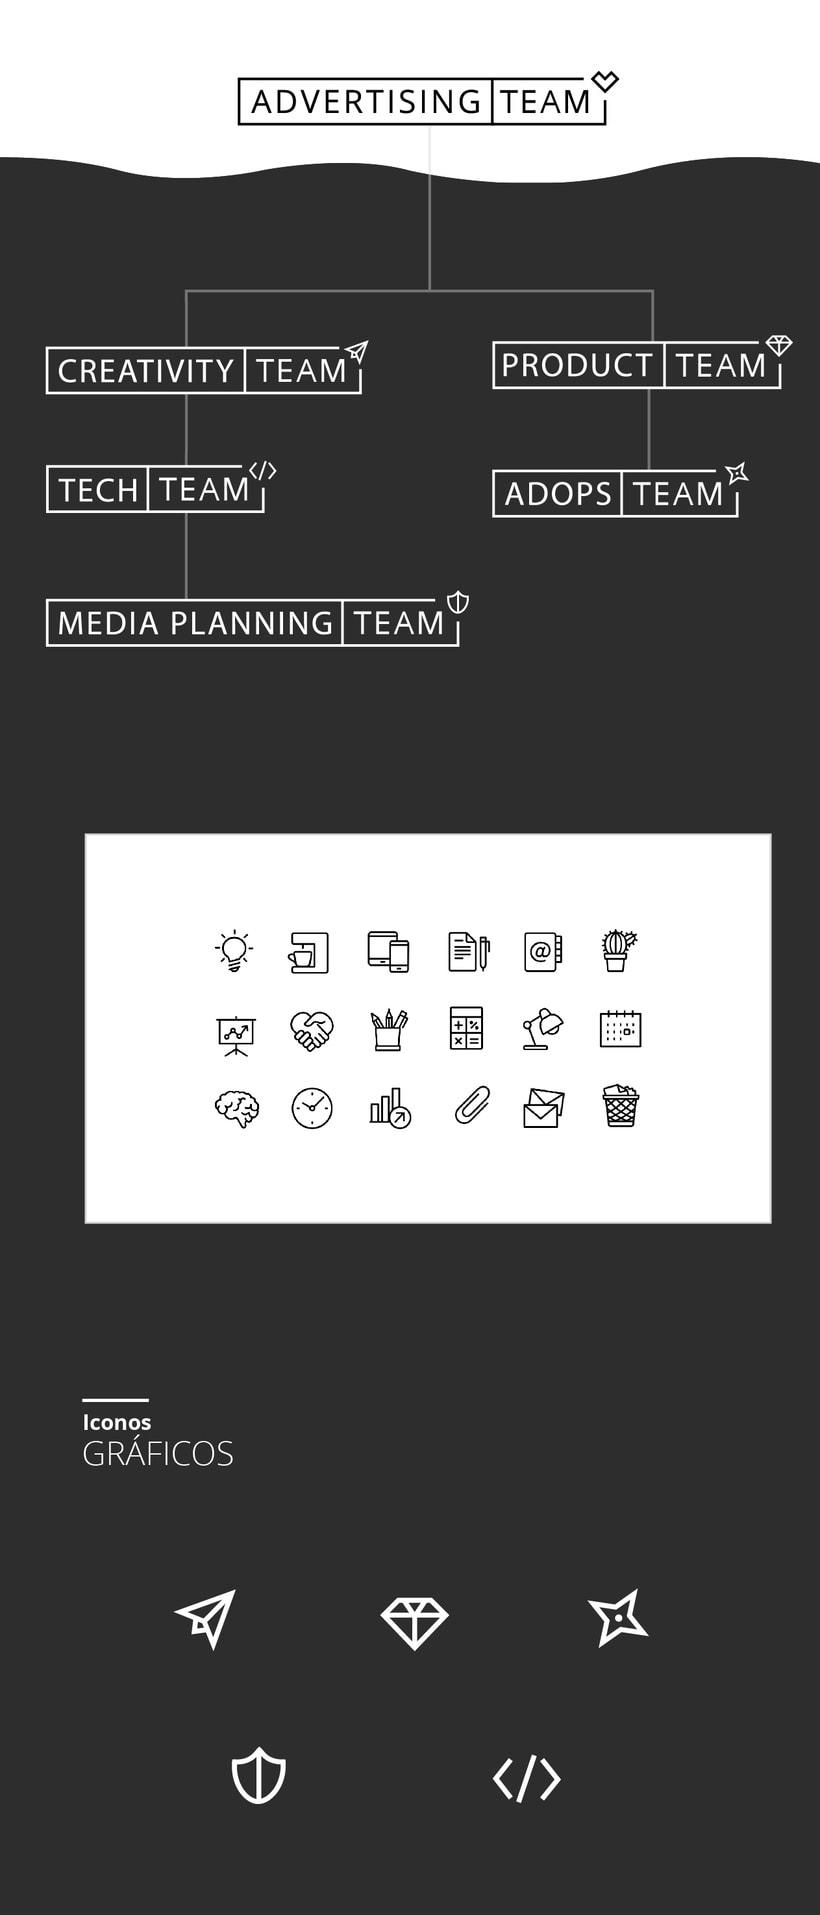 Brand Manual AD TEAM 2